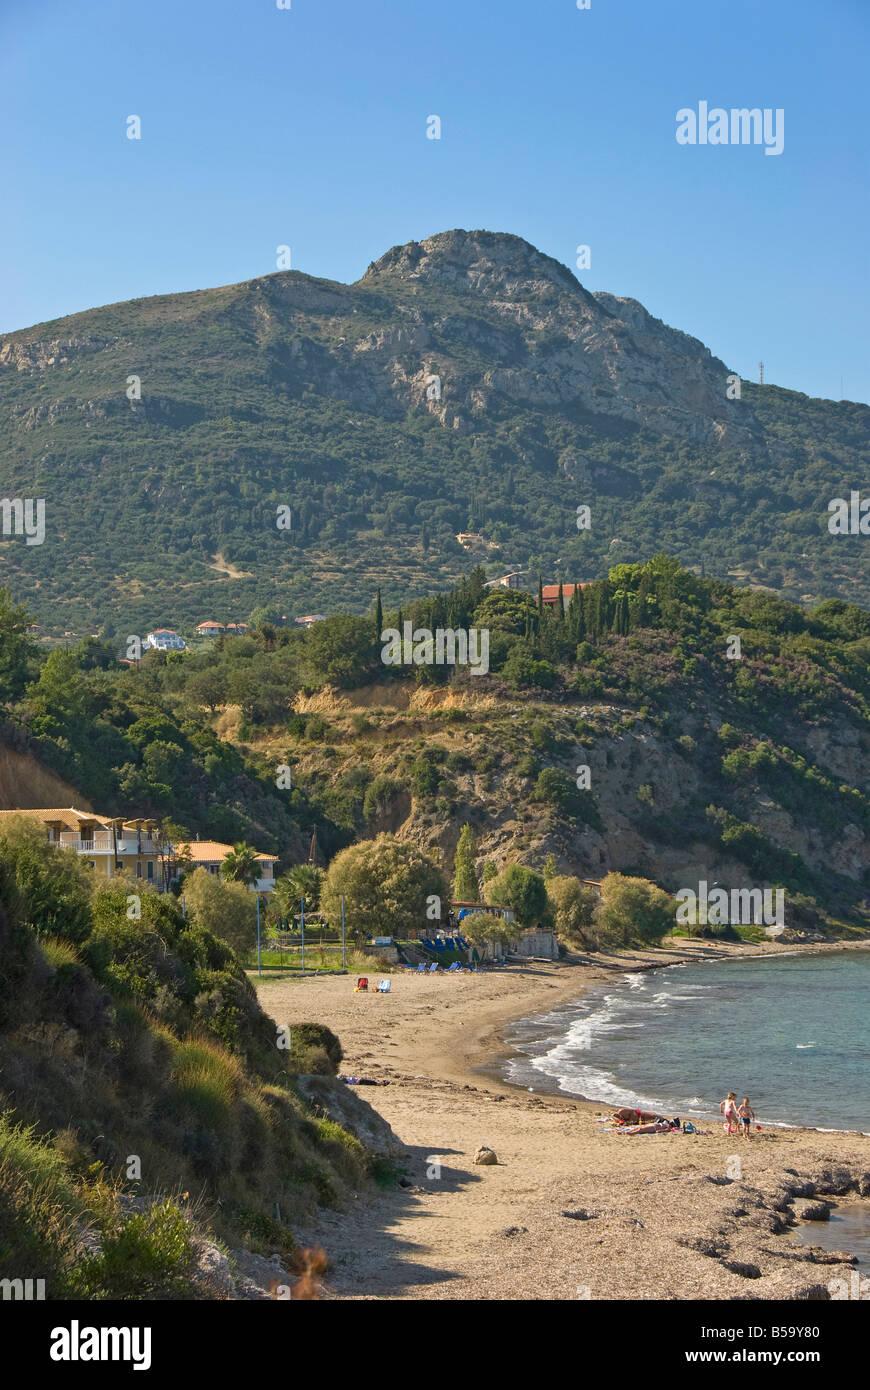 Porto Zoro Beach, Zante, Ionian Islands Greece. - Stock Image